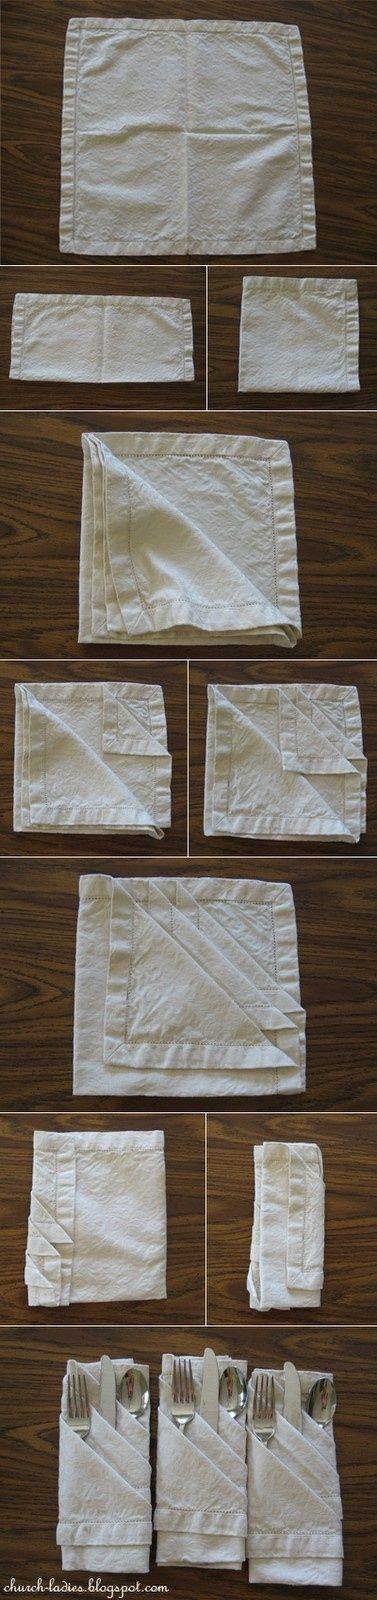 The French Pleat Napkin | 28 Creative Napkin-Folding Techniques